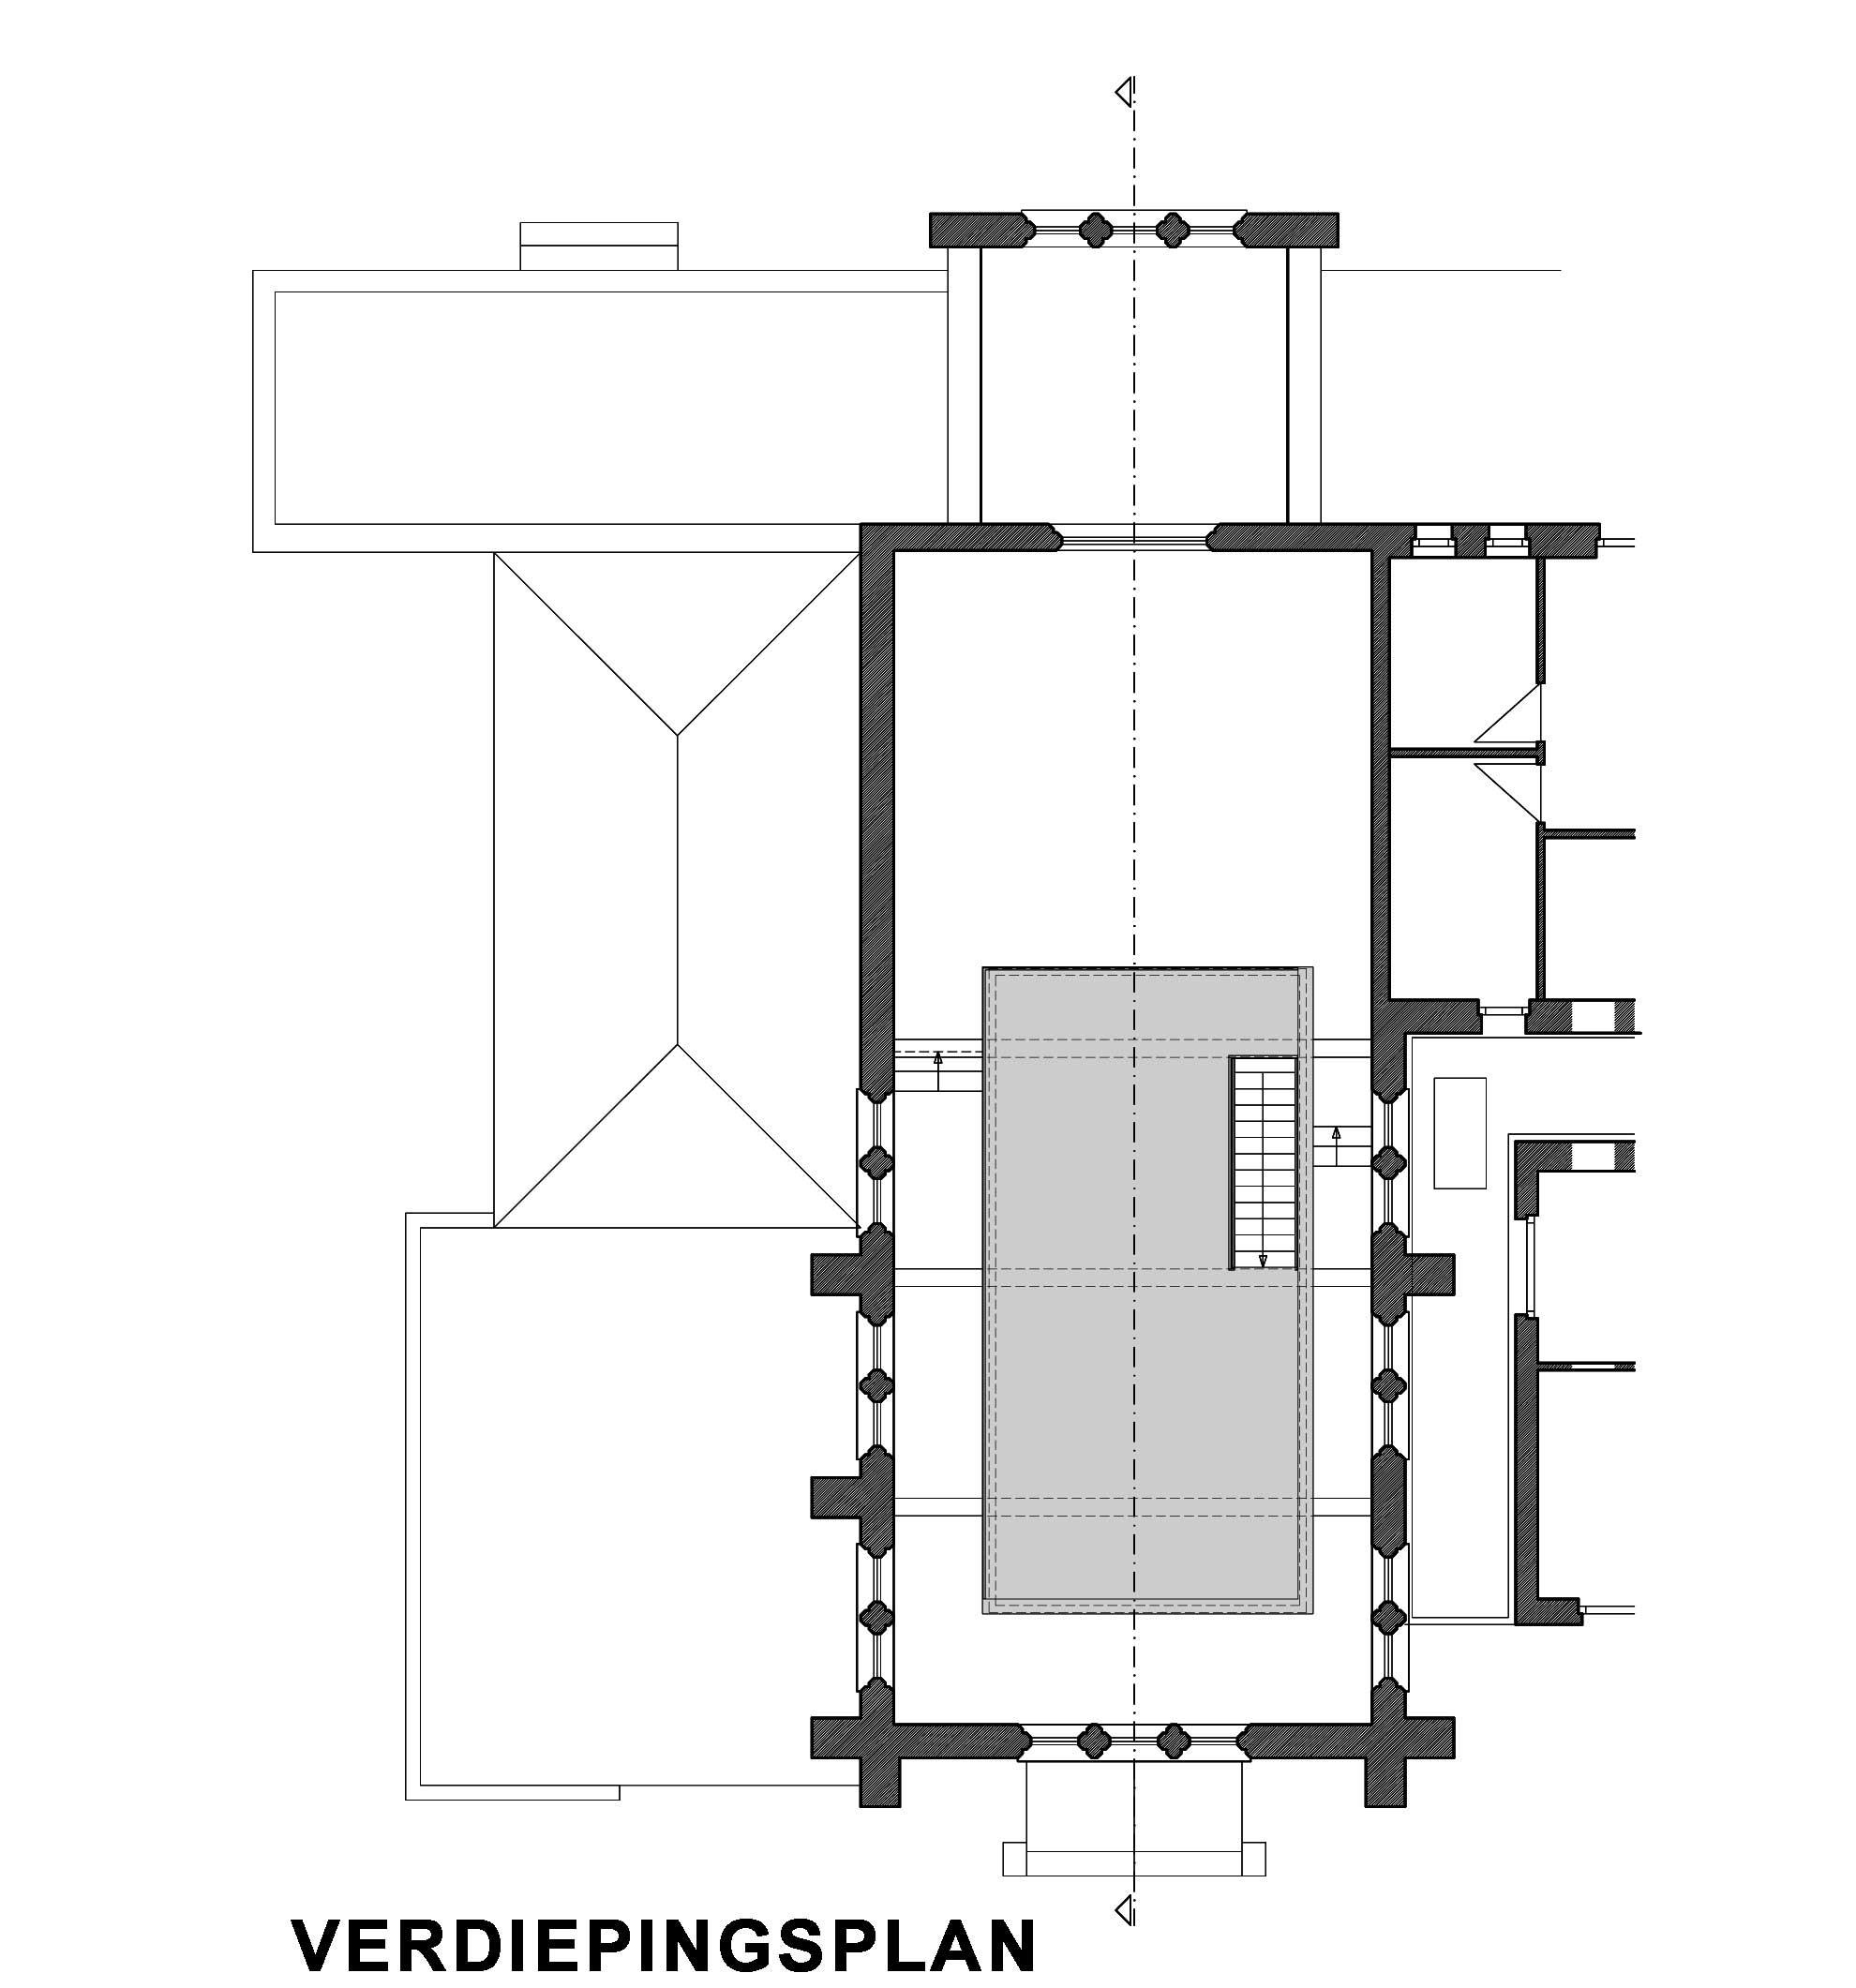 Verdiepingsplan renovatie Karmel Brugge AVDK Architecten